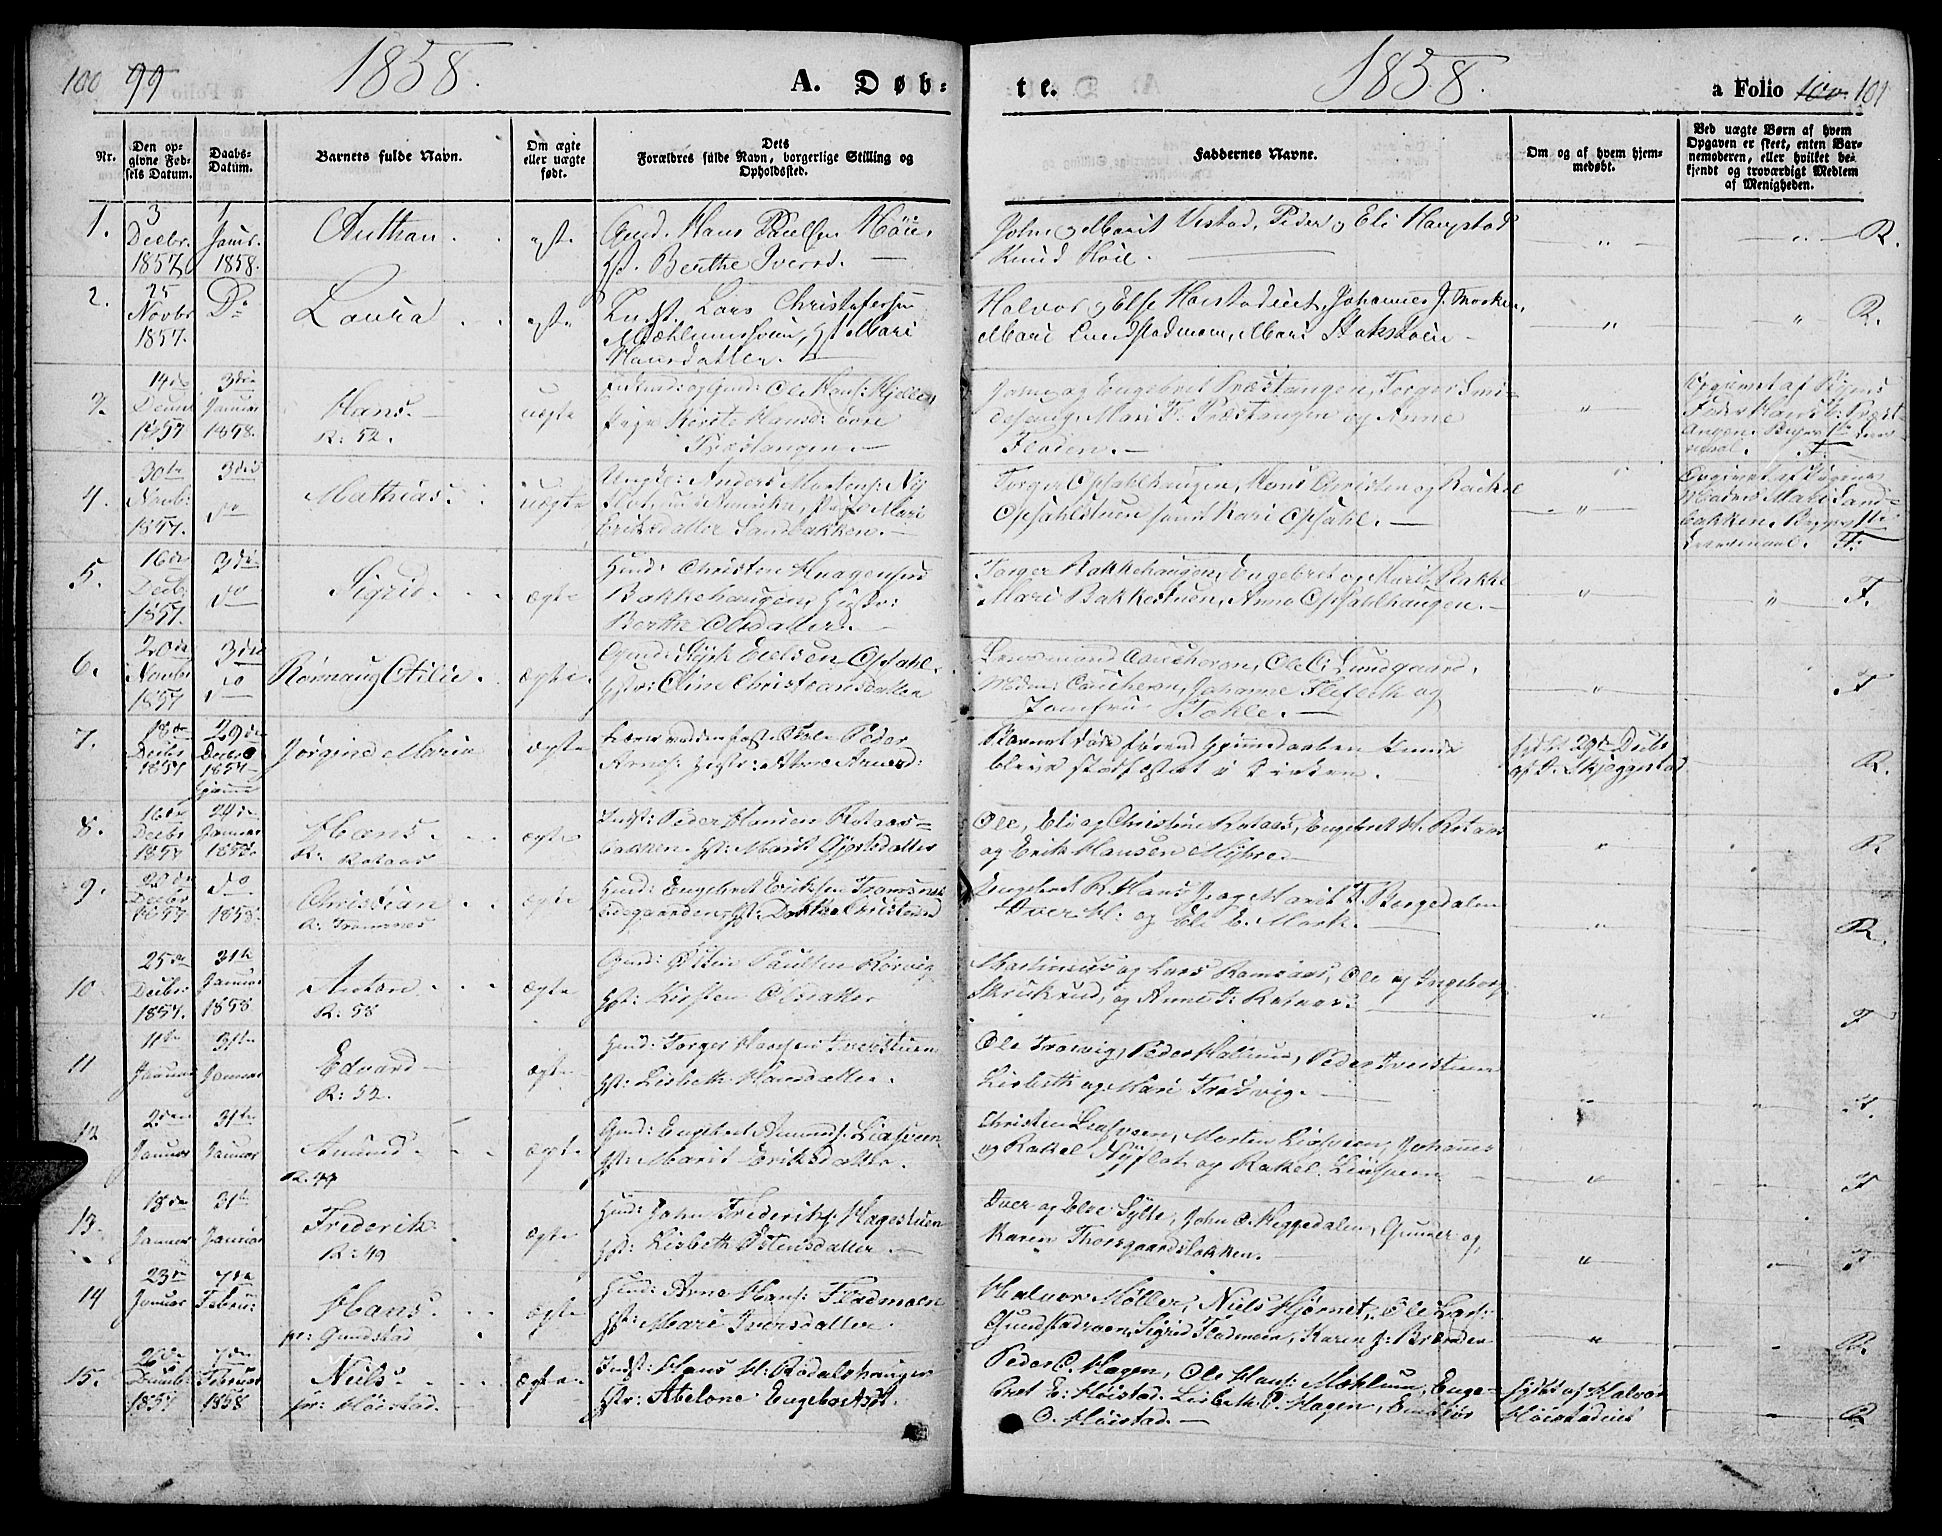 SAH, Ringebu prestekontor, Klokkerbok nr. 3, 1854-1866, s. 100-101